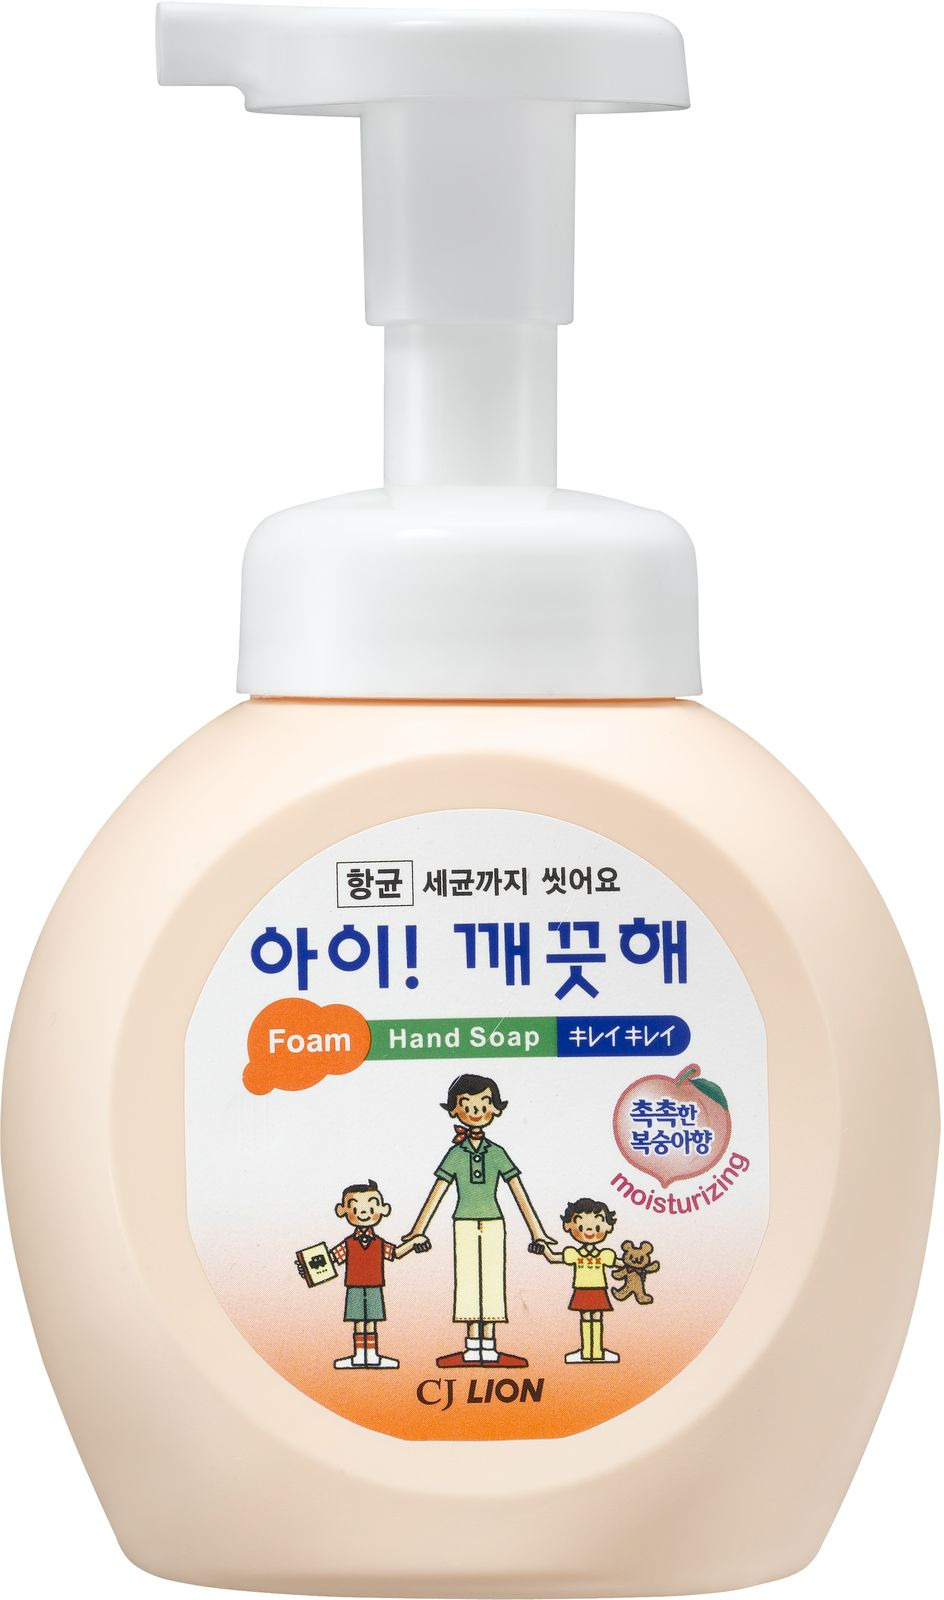 Жидкое мыло CJ Lion Ai-Kekute, с ароматом персика, 250 мл